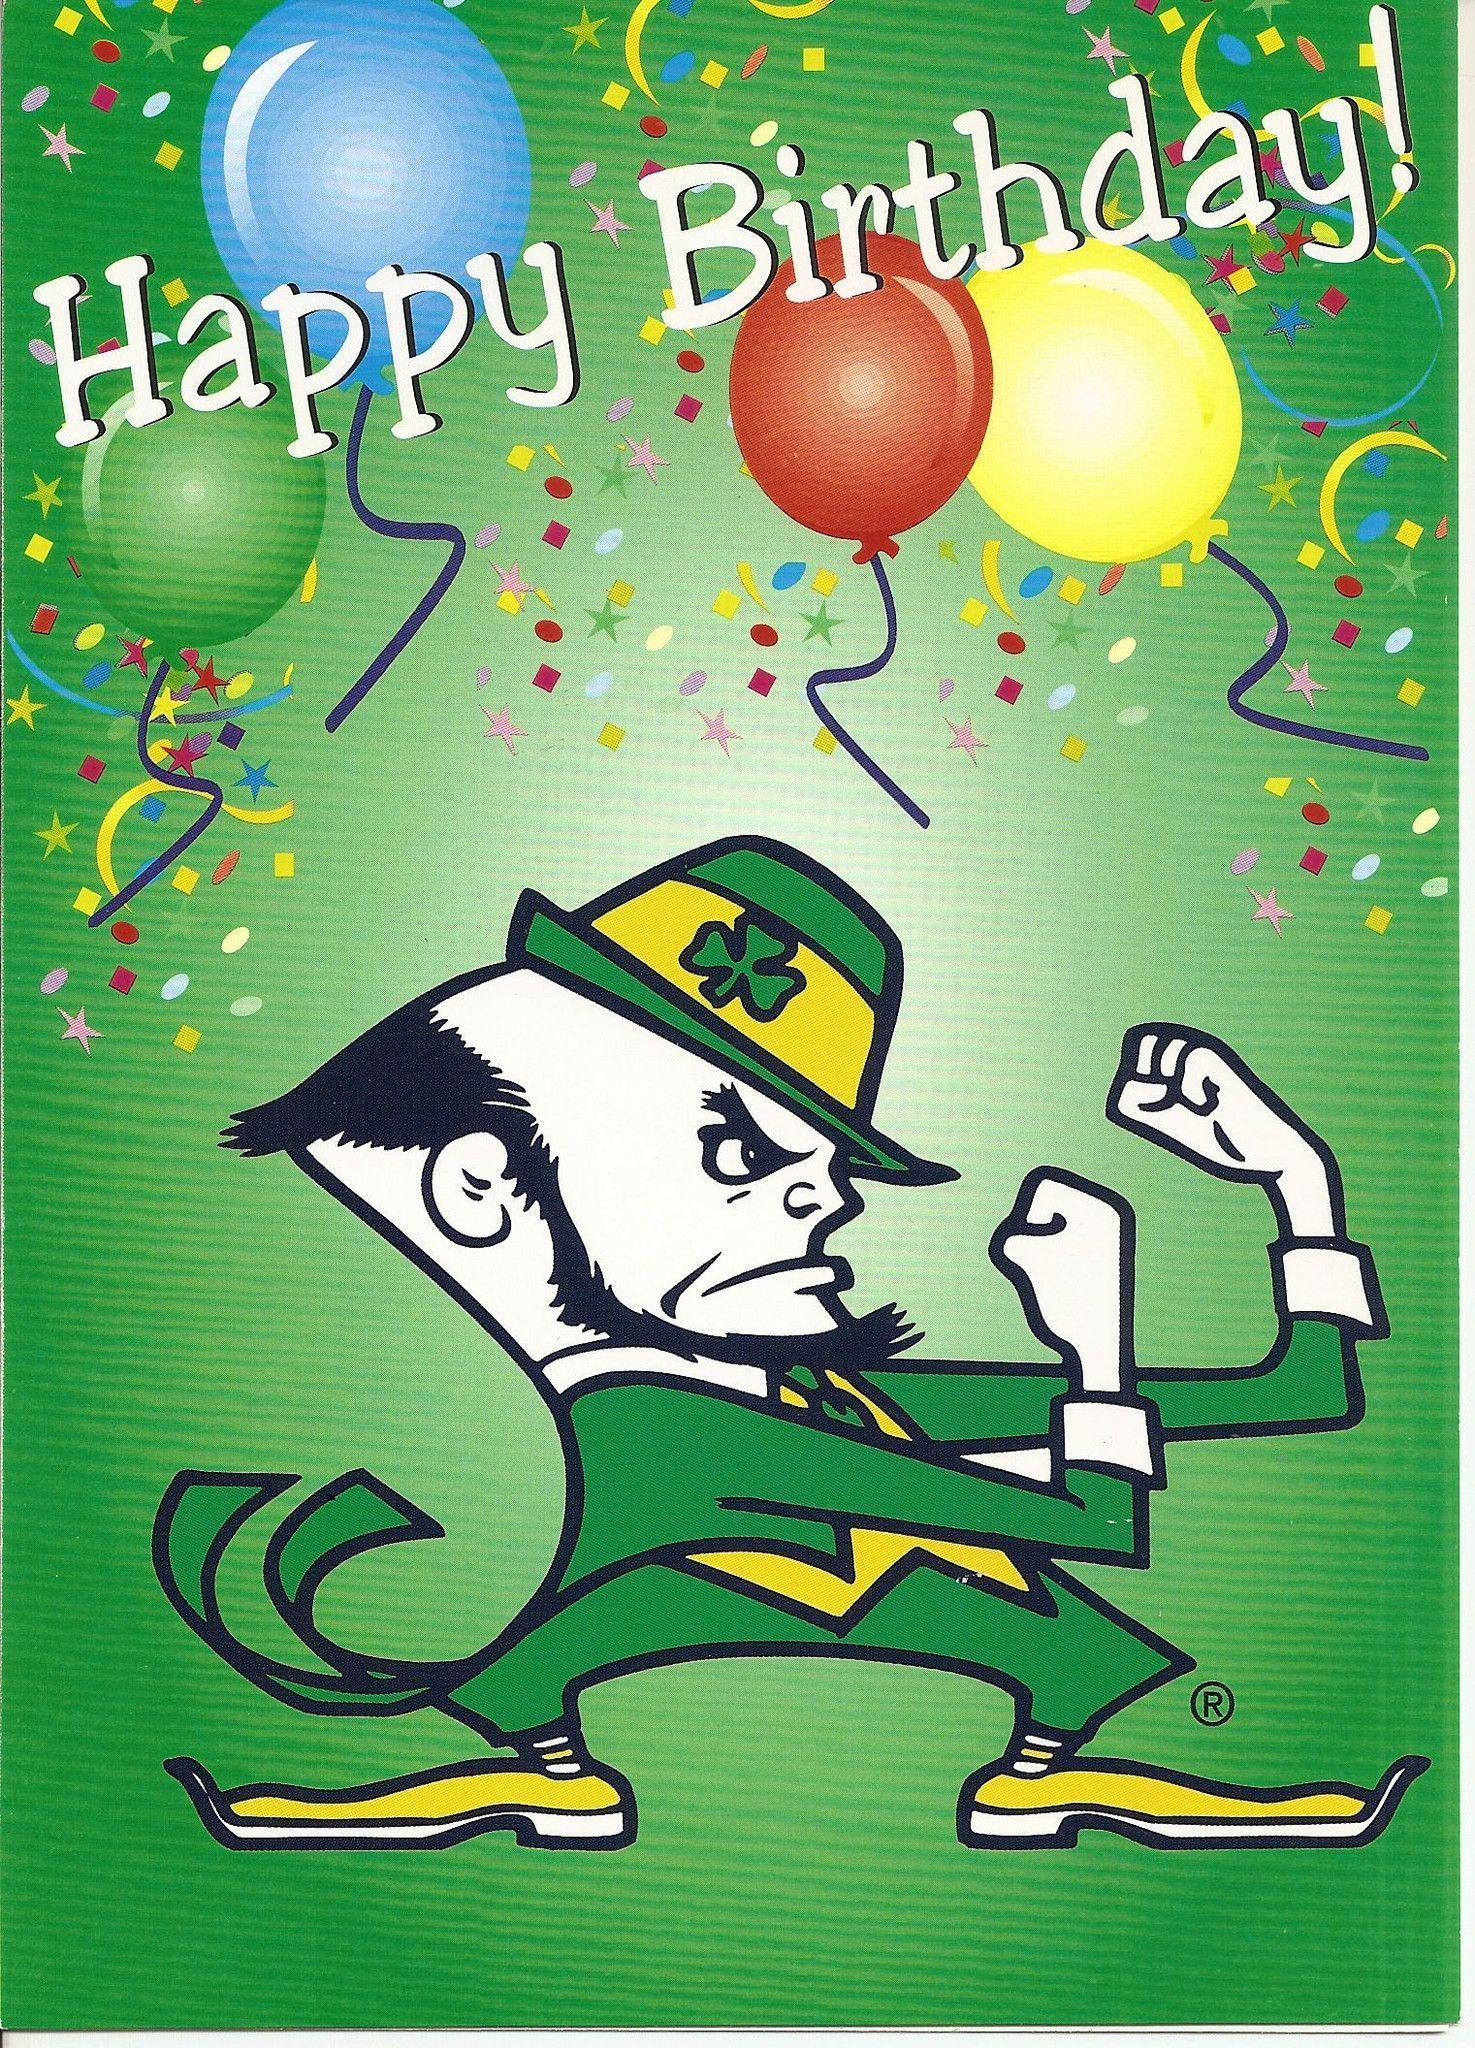 Notre Dame Fighting Irish Happy Birthday. Greeting Card